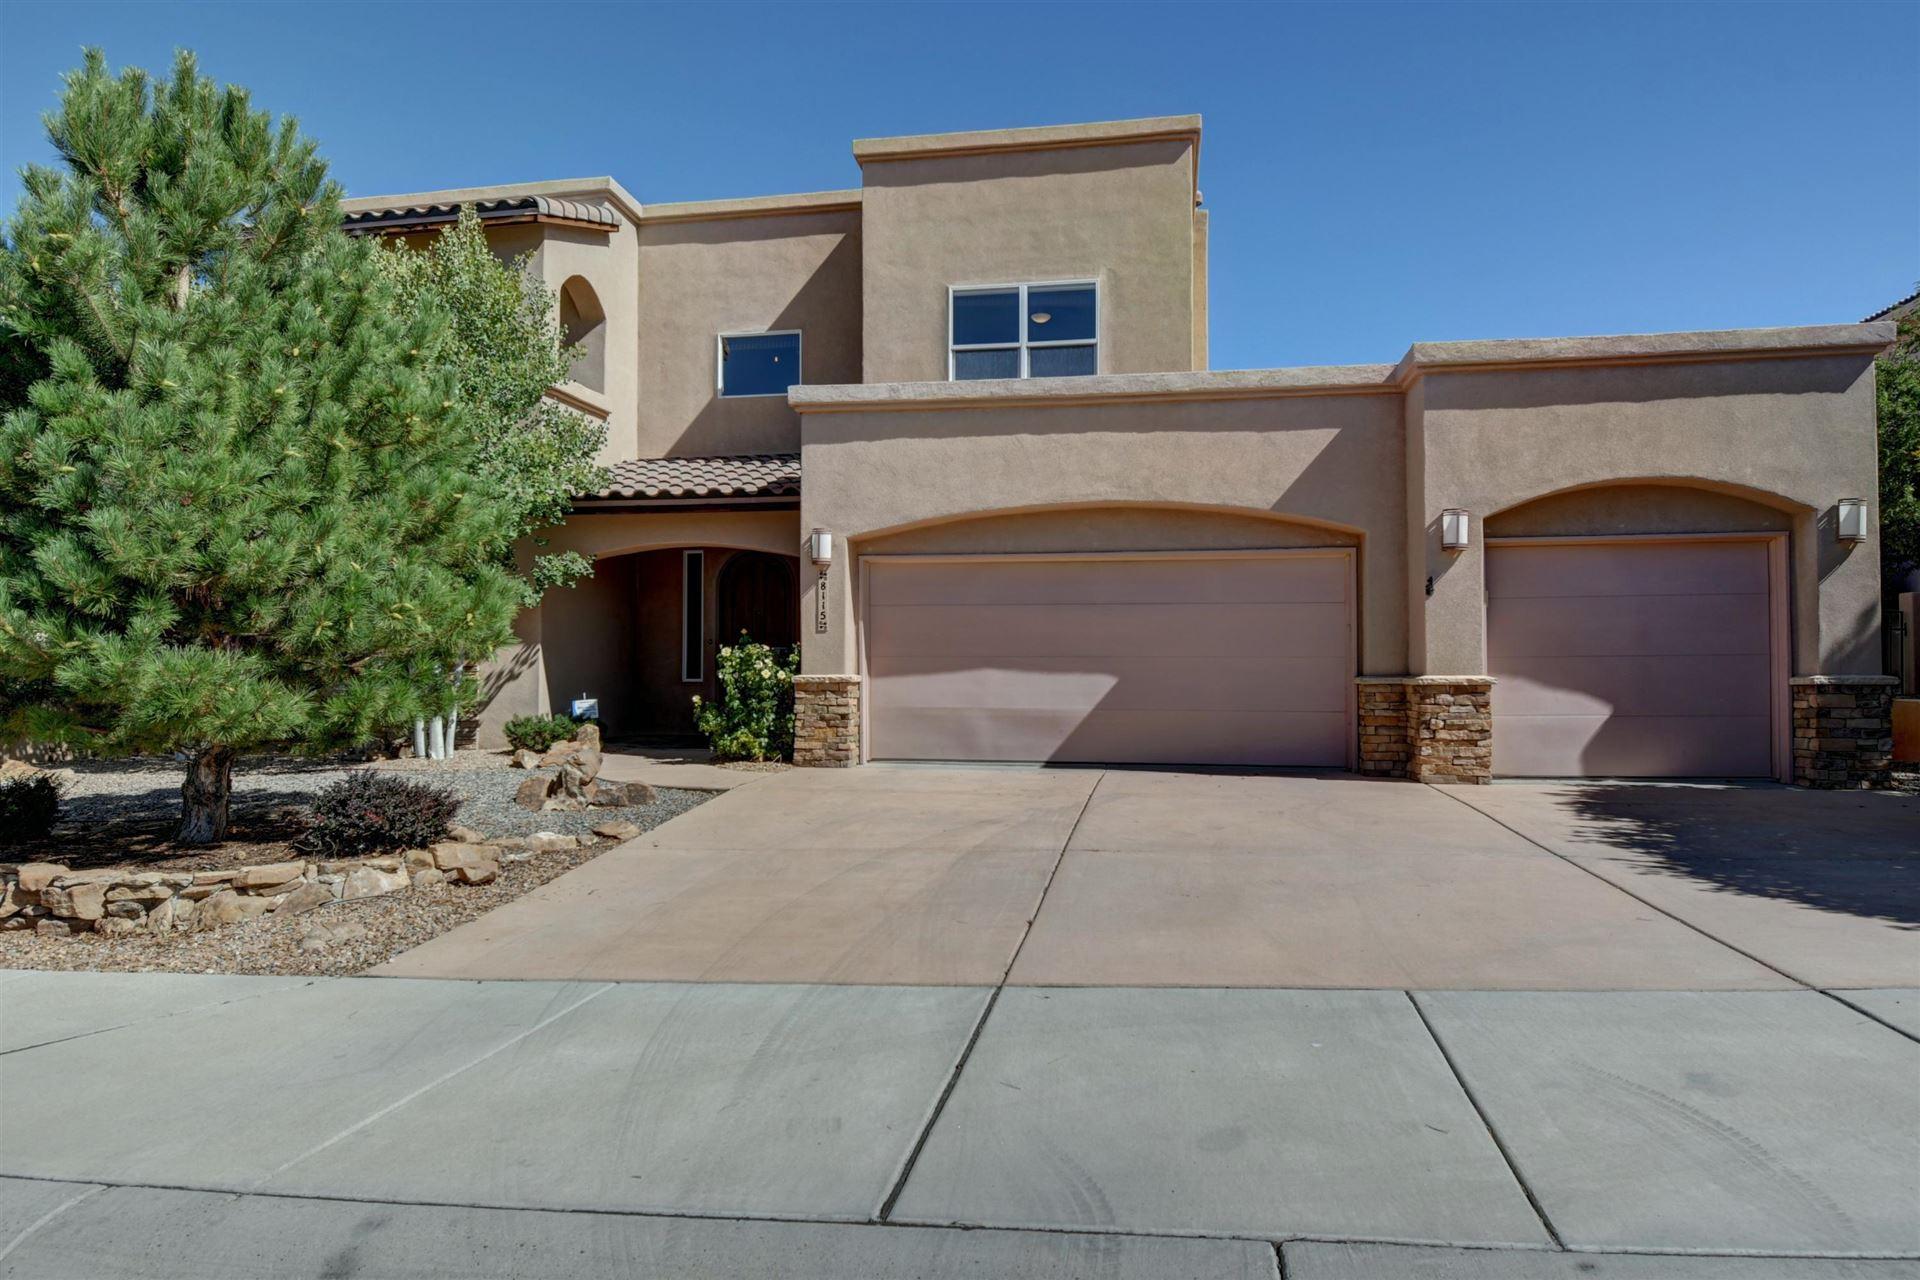 Photo of 8115 VIA ALEGRE NE, Albuquerque, NM 87122 (MLS # 963111)